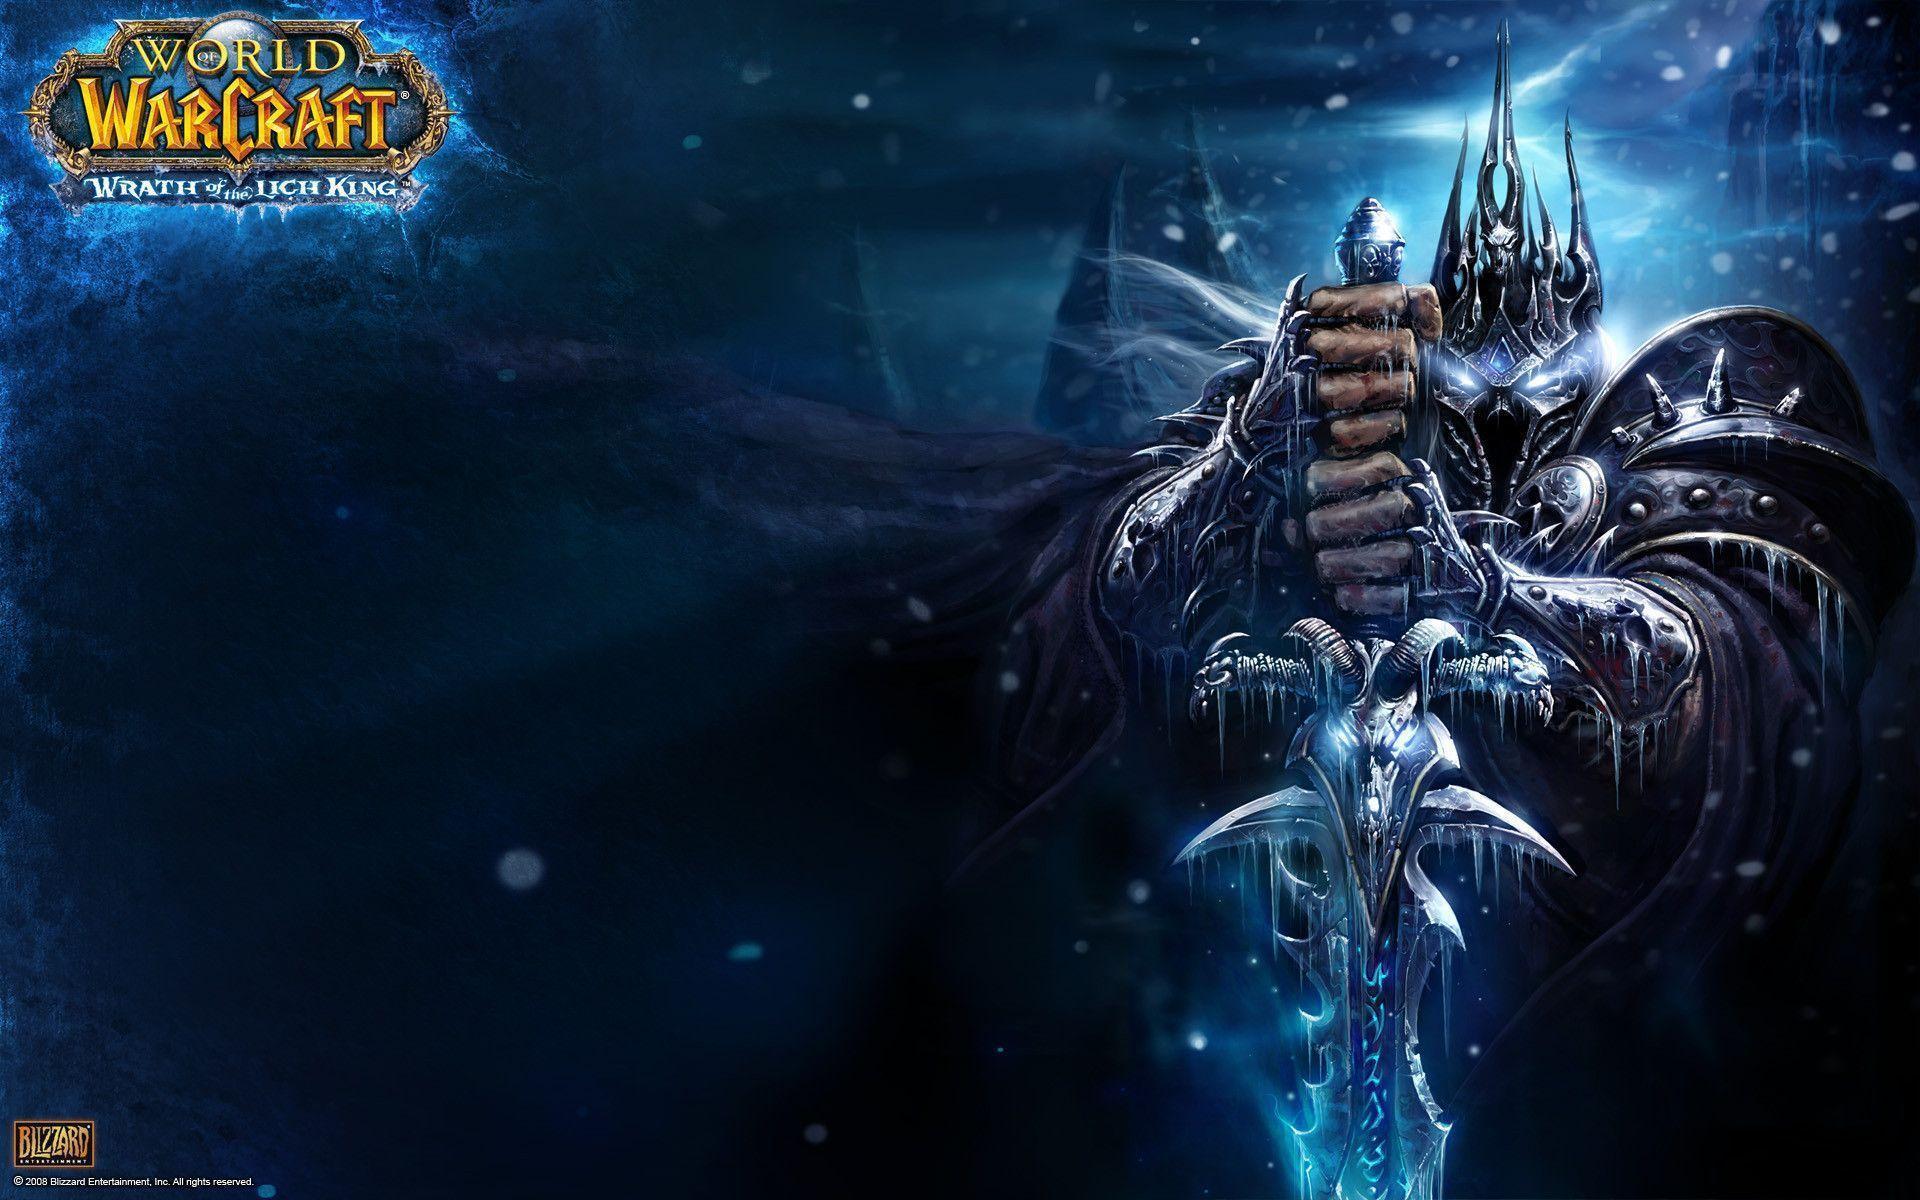 World Of Warcraft Wallpapers Hd wallpaper - 128012